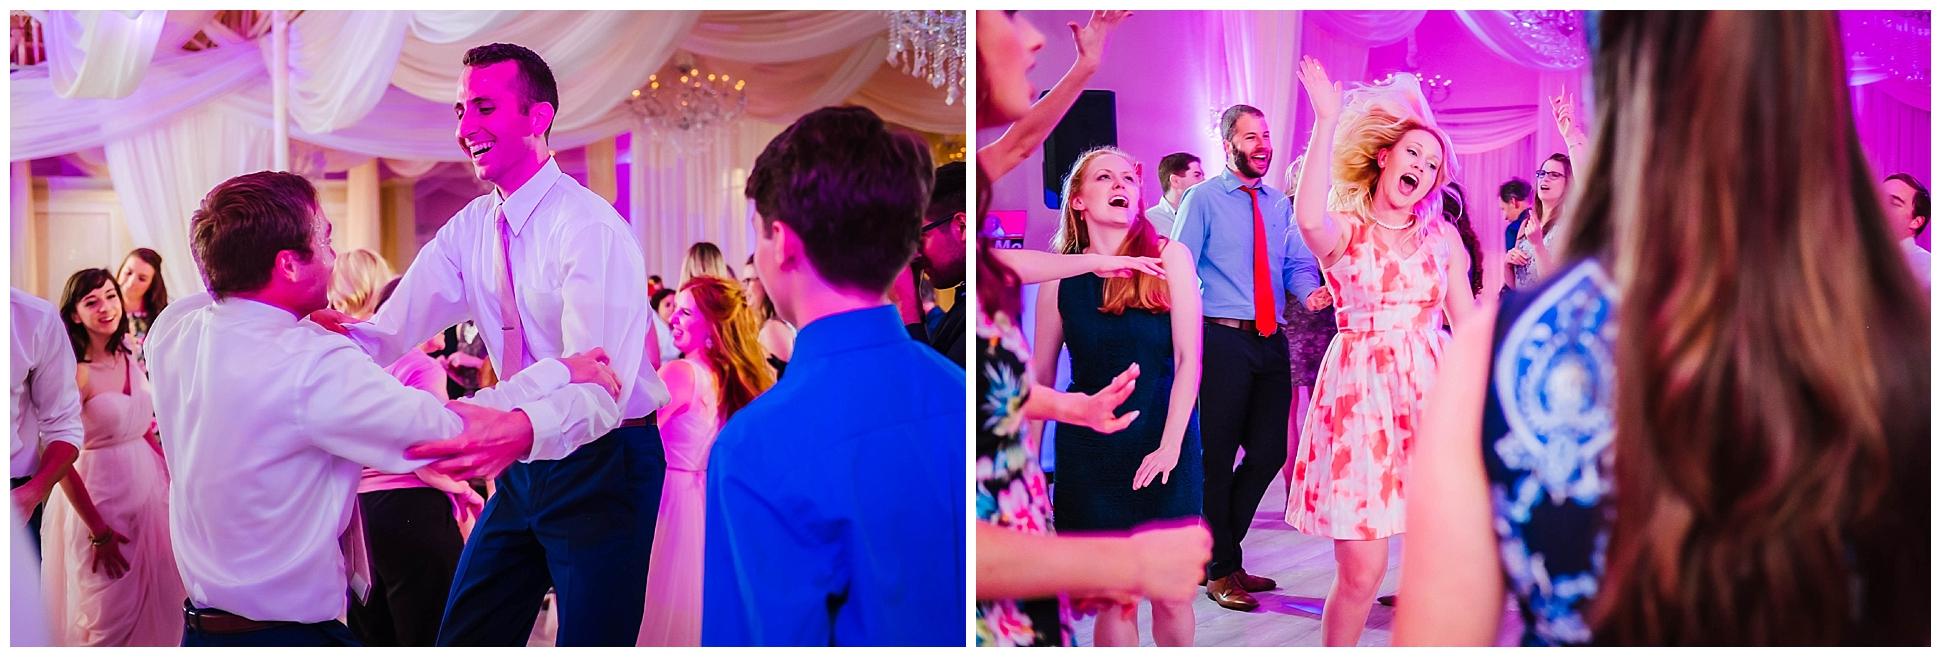 st-pete-wedding-photographer-sunken-gardens-crystal-ballroom-princess-dancer_0198.jpg